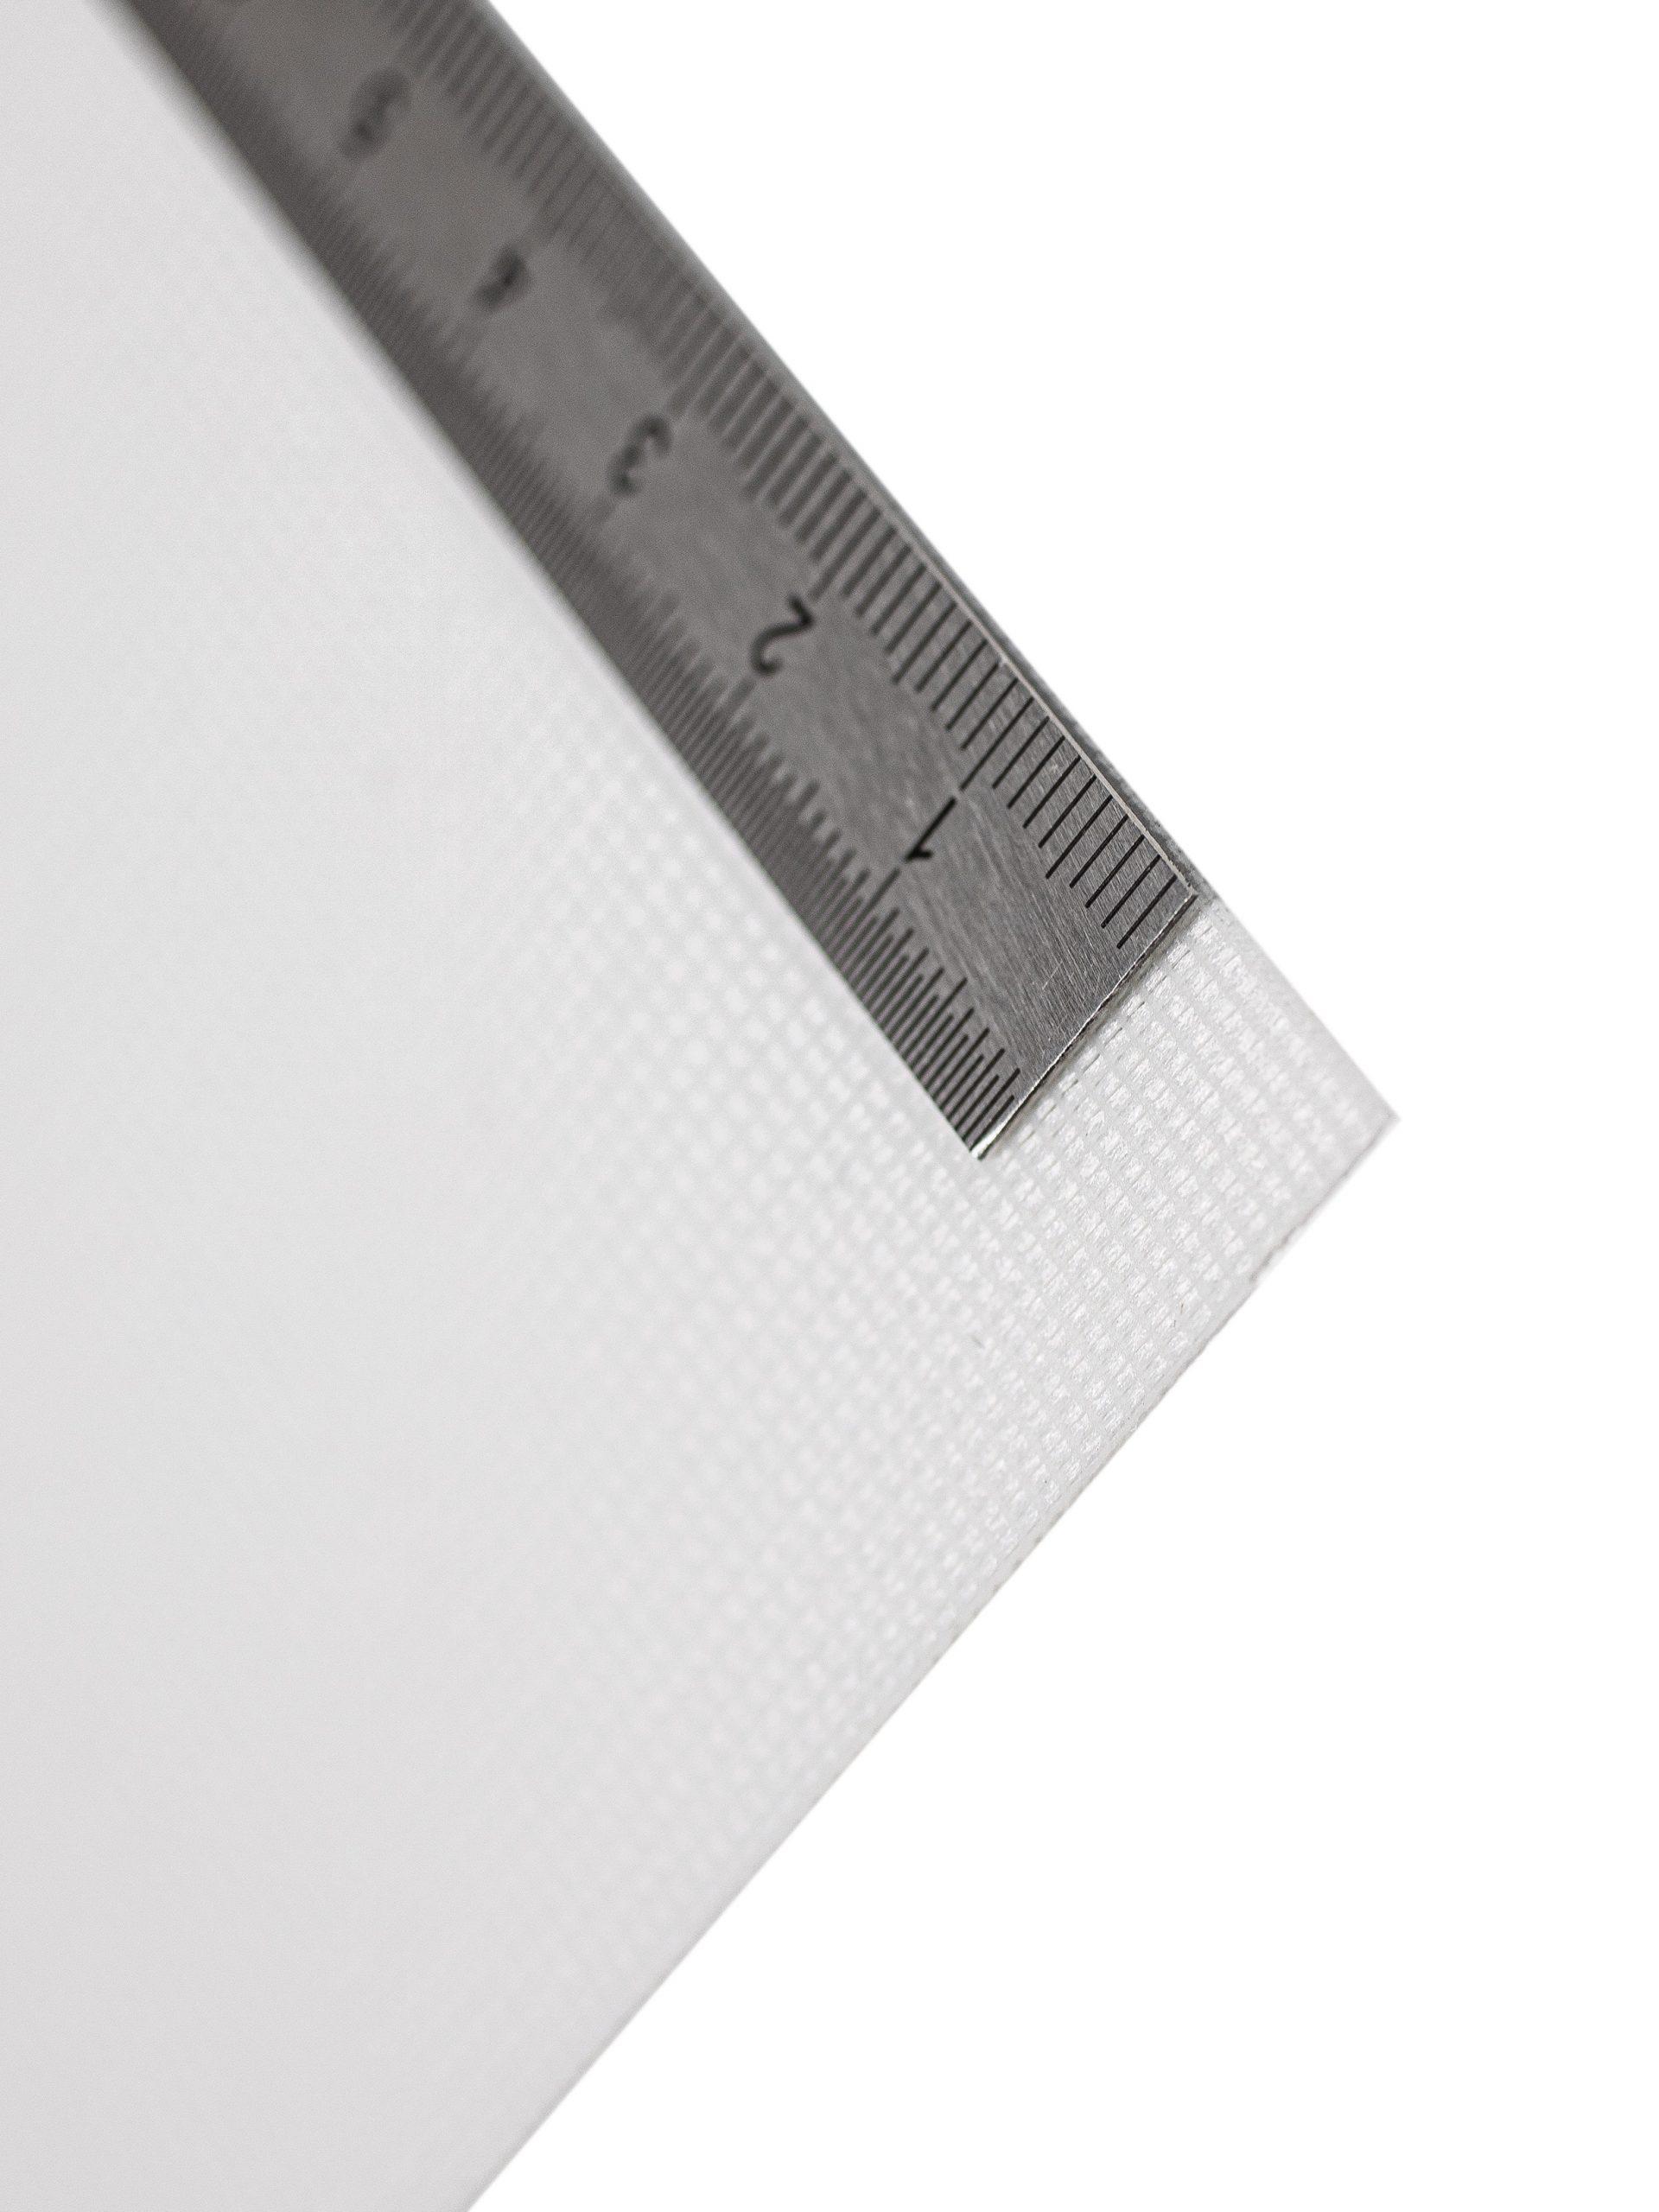 An der Kante des Textil Decolux 2508 weiß liegt ein Maßband